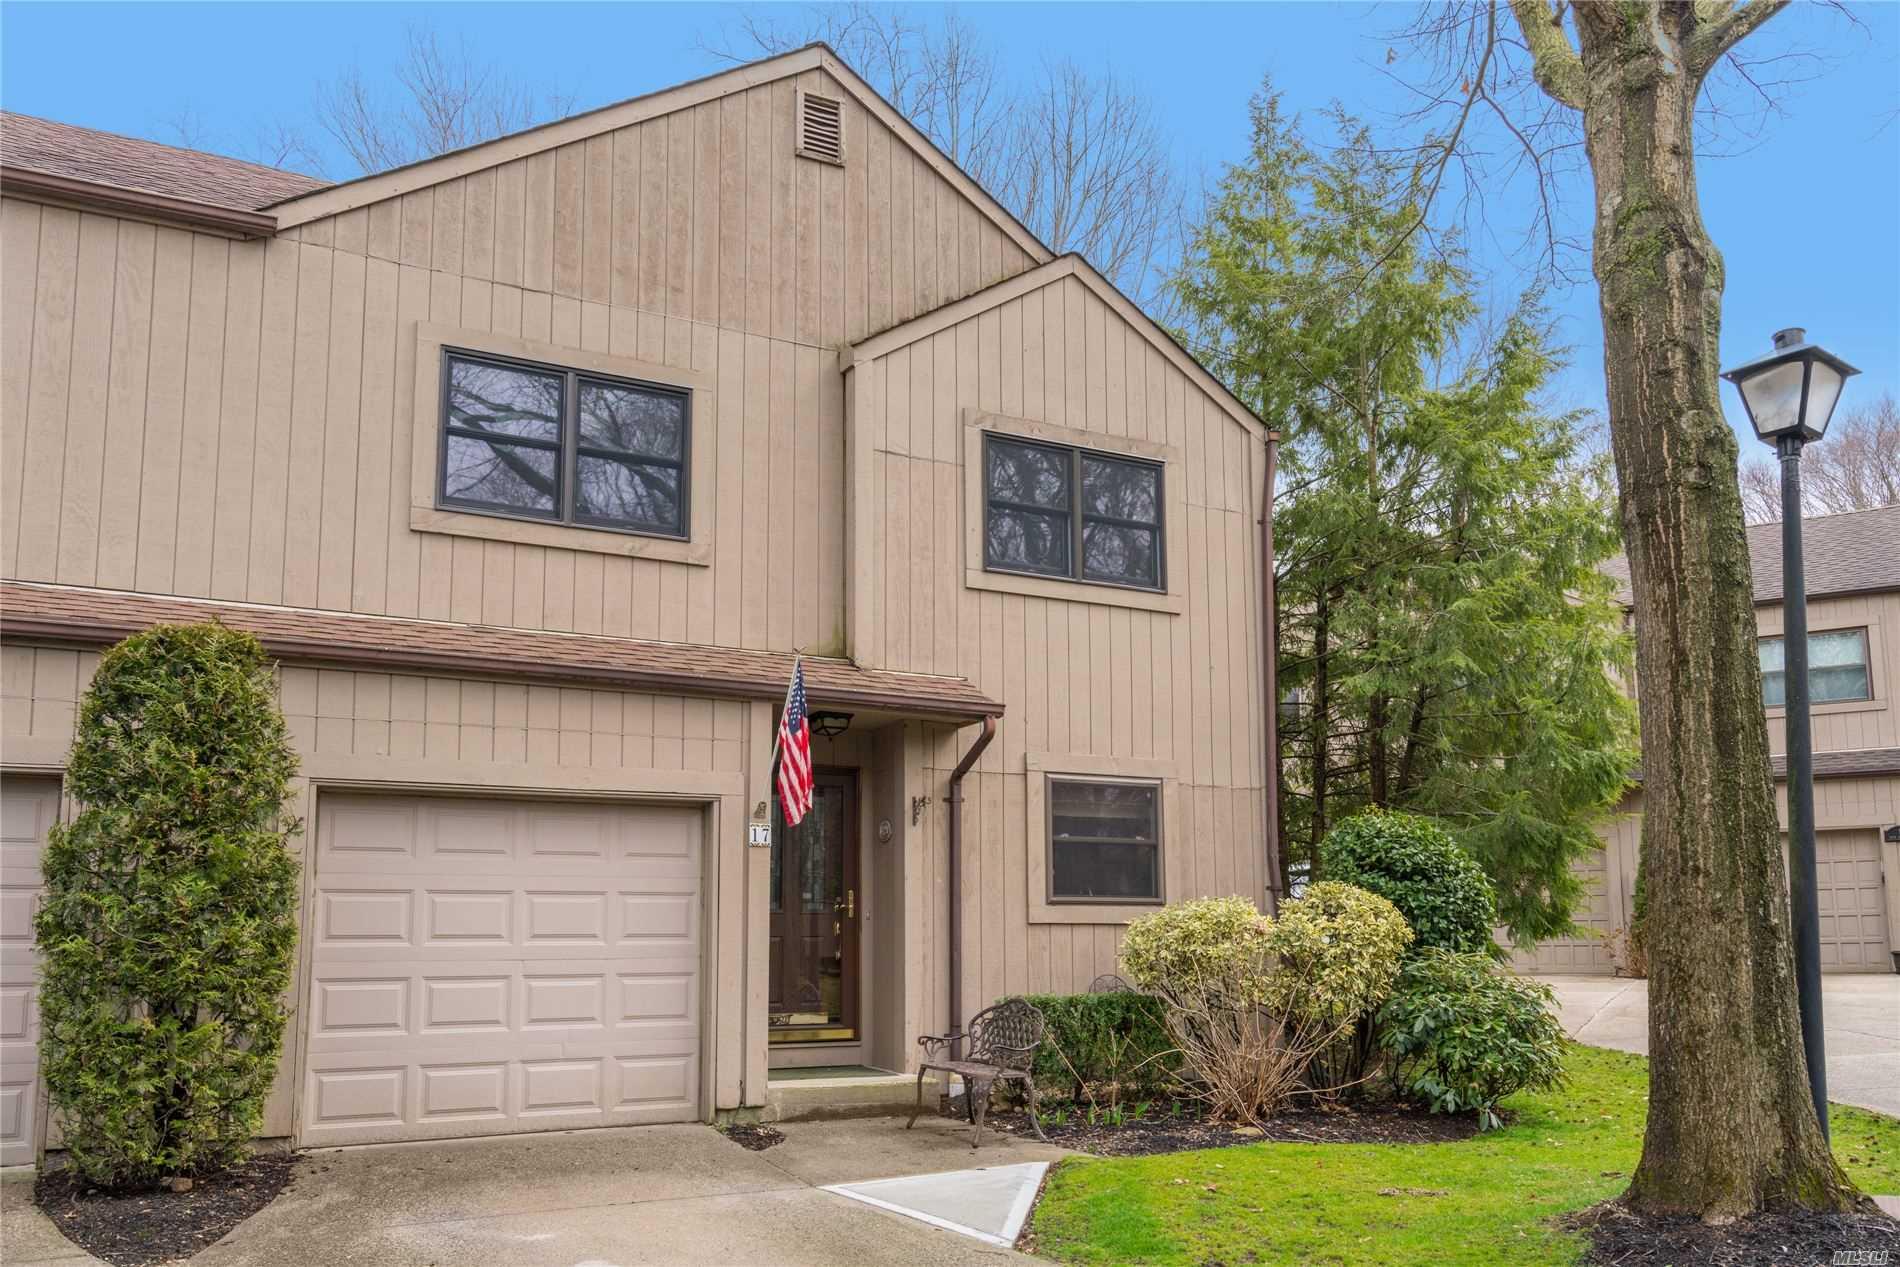 Property for sale at 17 High Oak Ct, Huntington NY 11743, Huntington,  New York 11743